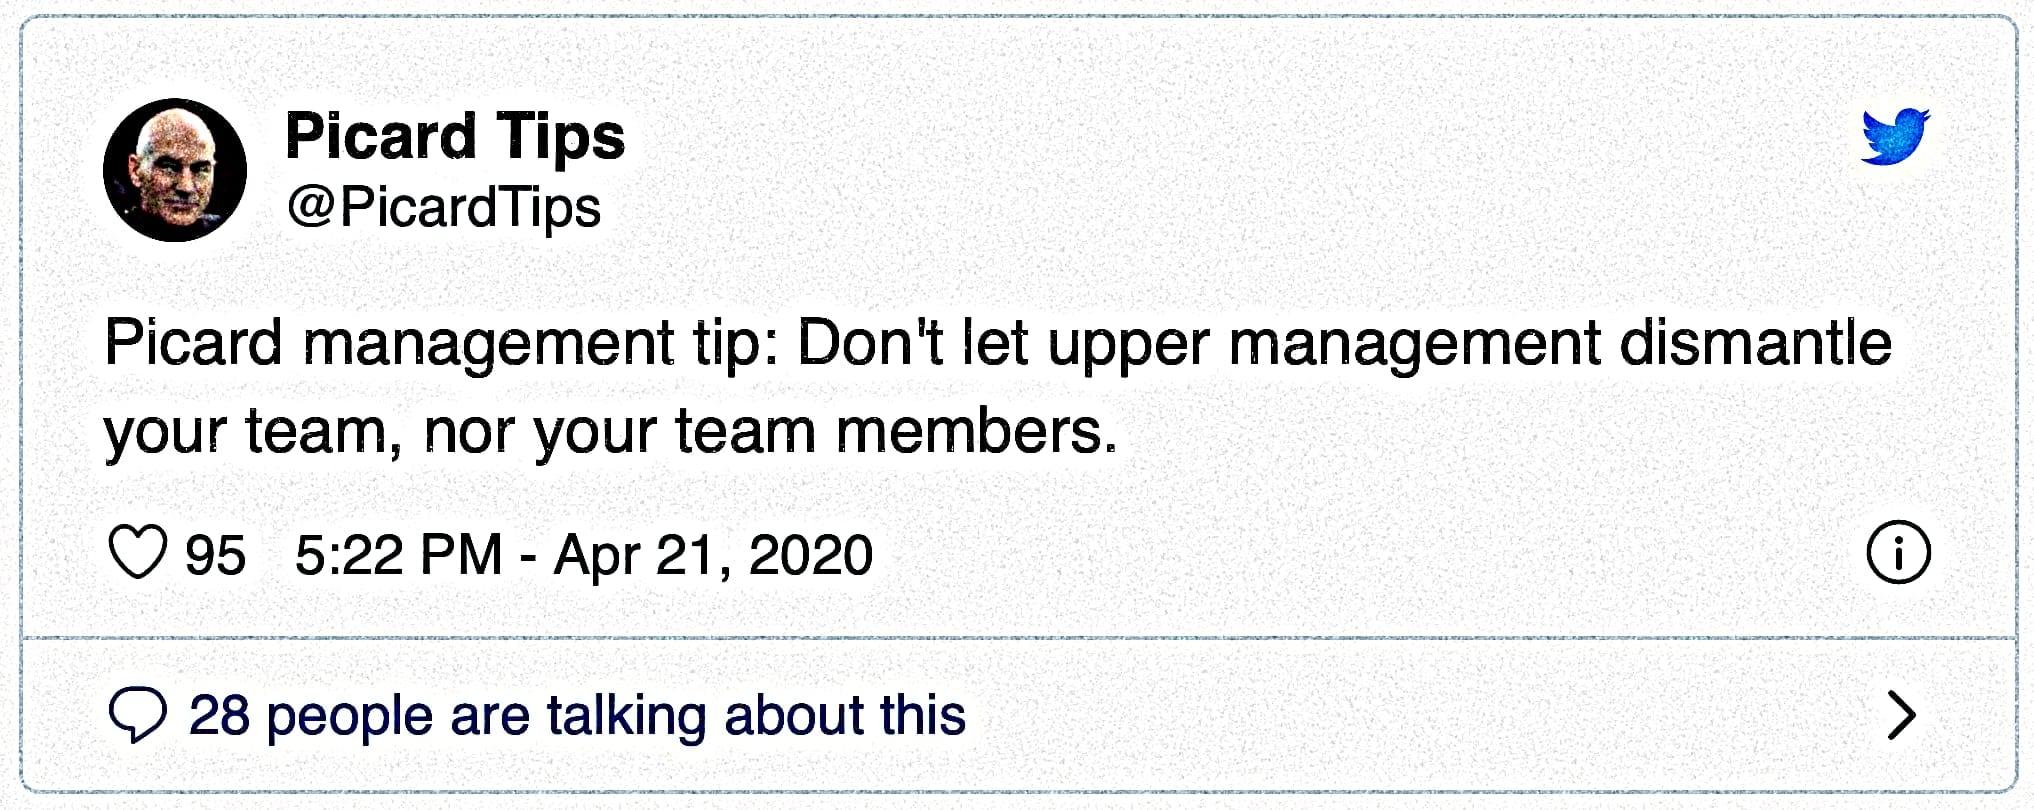 Picard management tip: Don't let upper management dismantle your team, nor your team members.